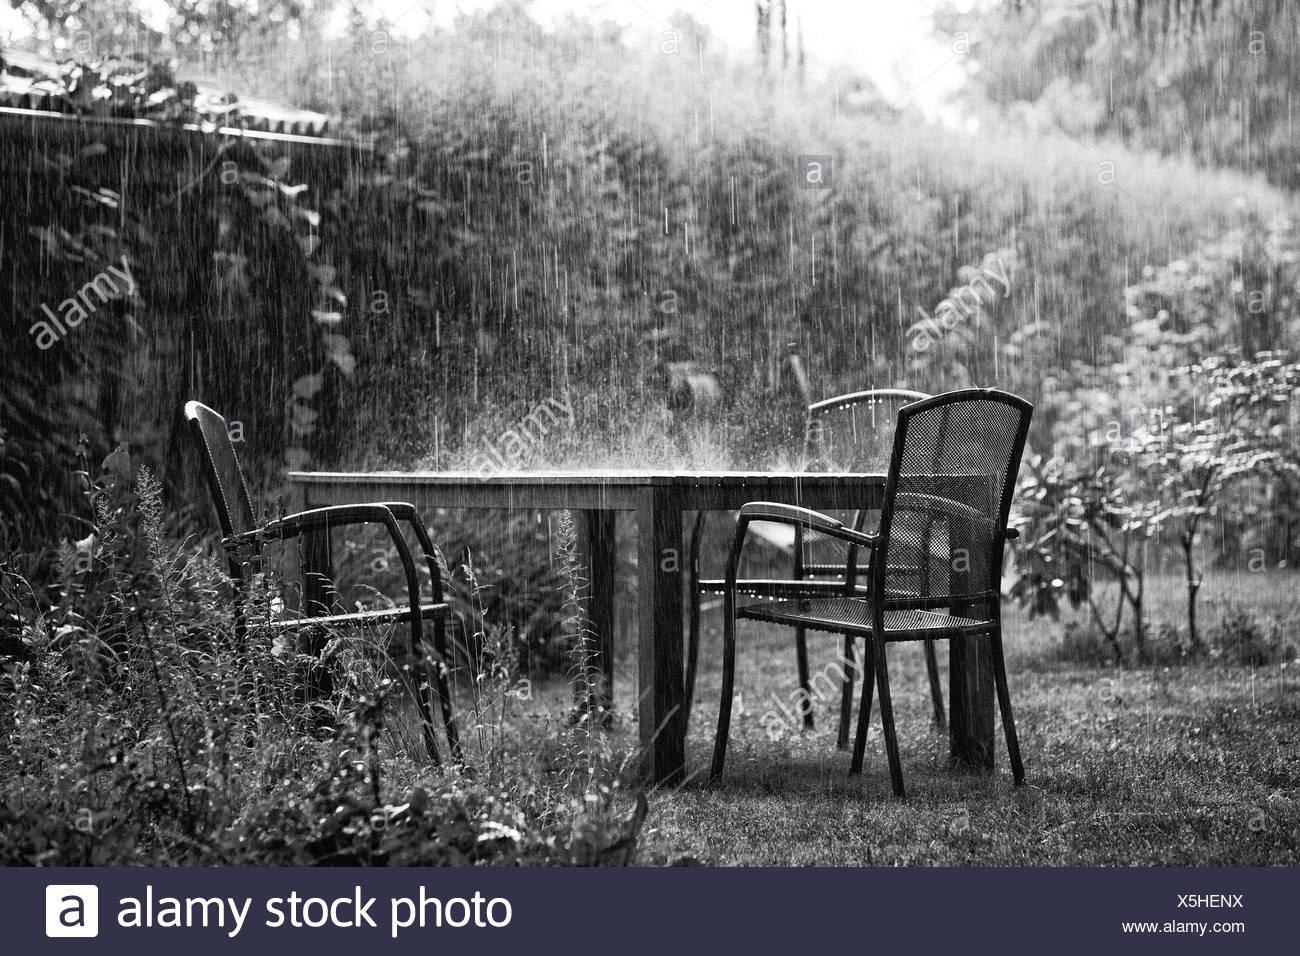 Garden furniture in a rainstorm - Stock Image